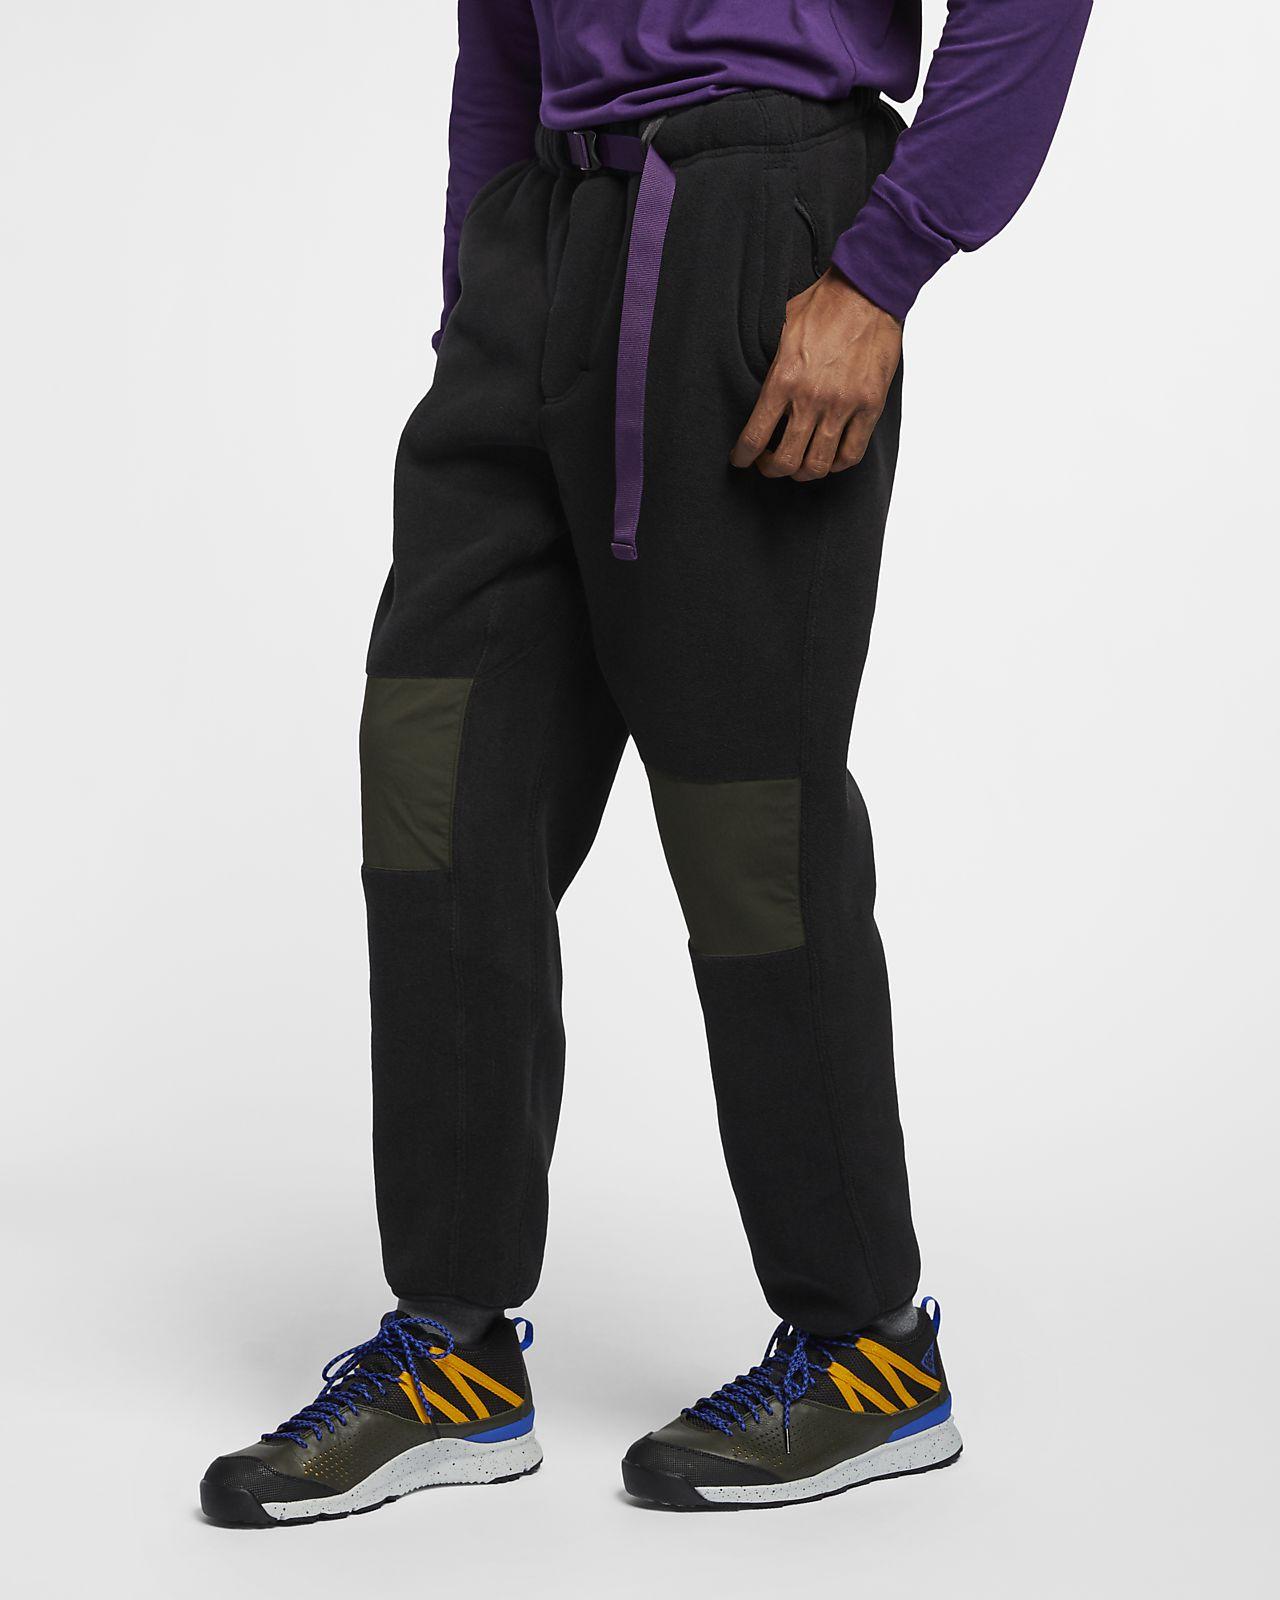 Lu Fleece Nike Sherpa Pantalon Tissu Acg En q6awgAAxp